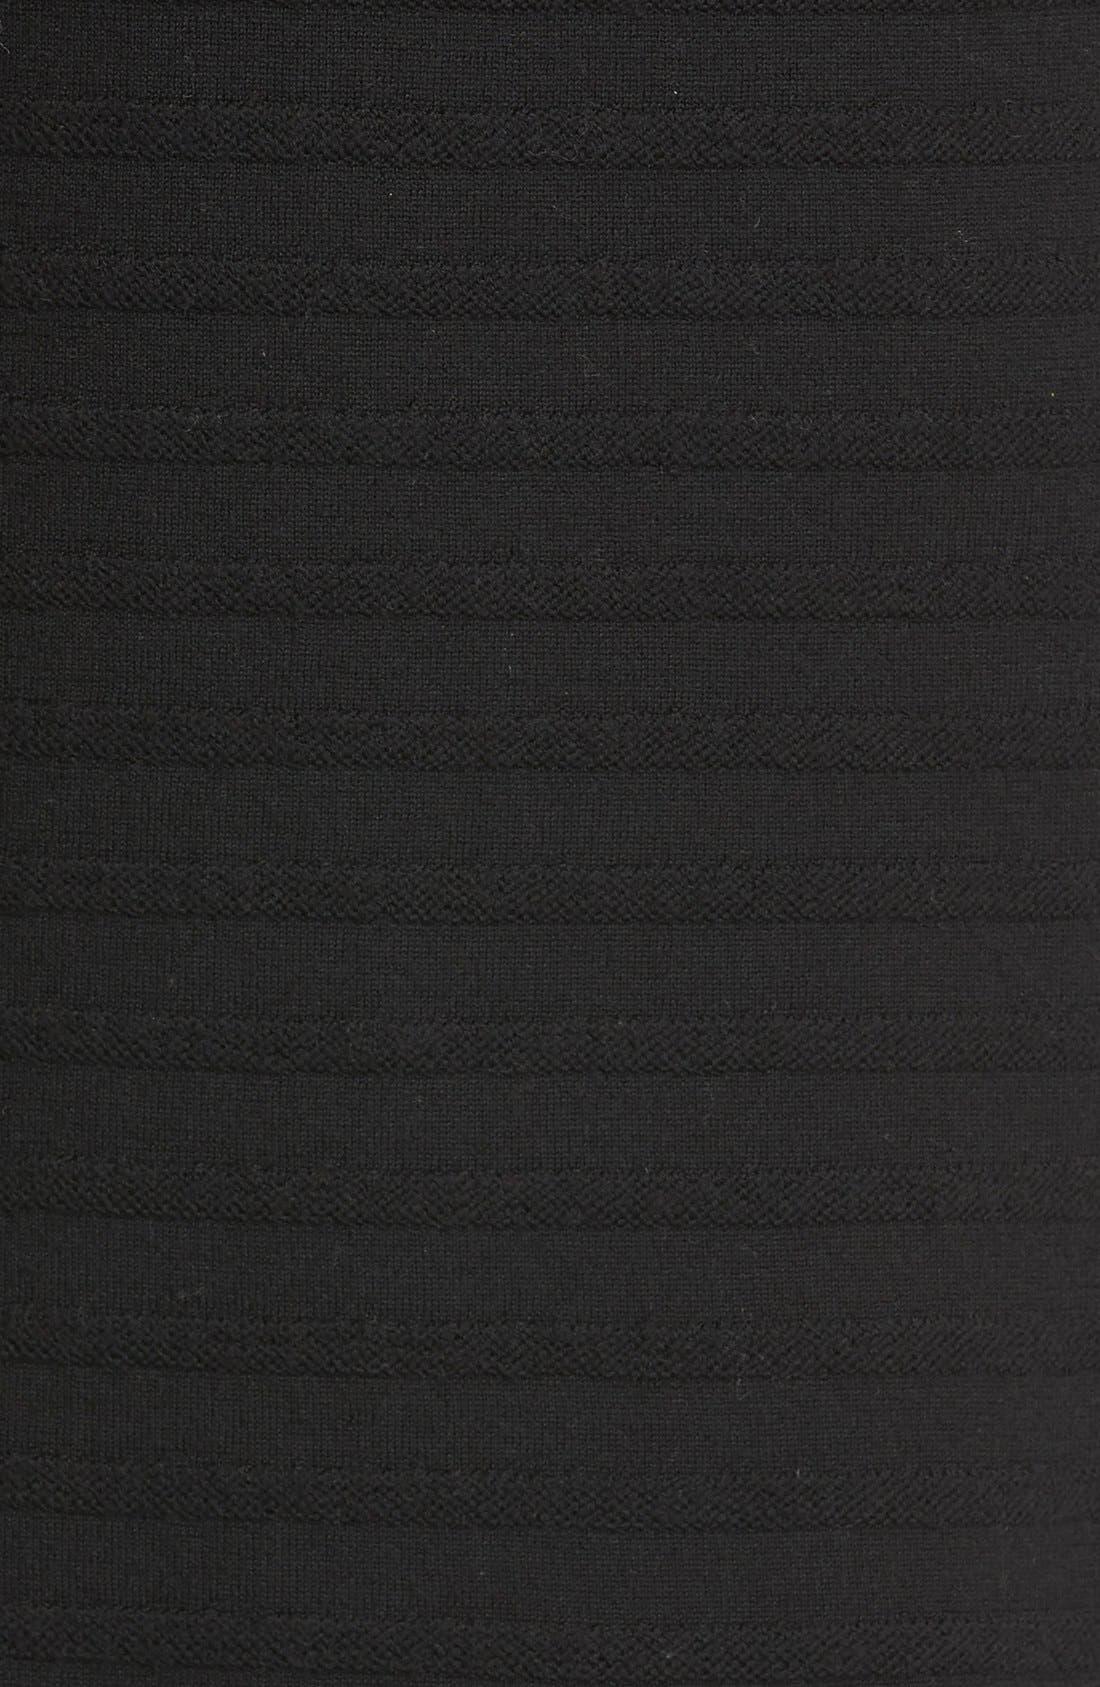 Alternate Image 5  - Tory Burch Giselle Textured Merino Wool Sweater Dress